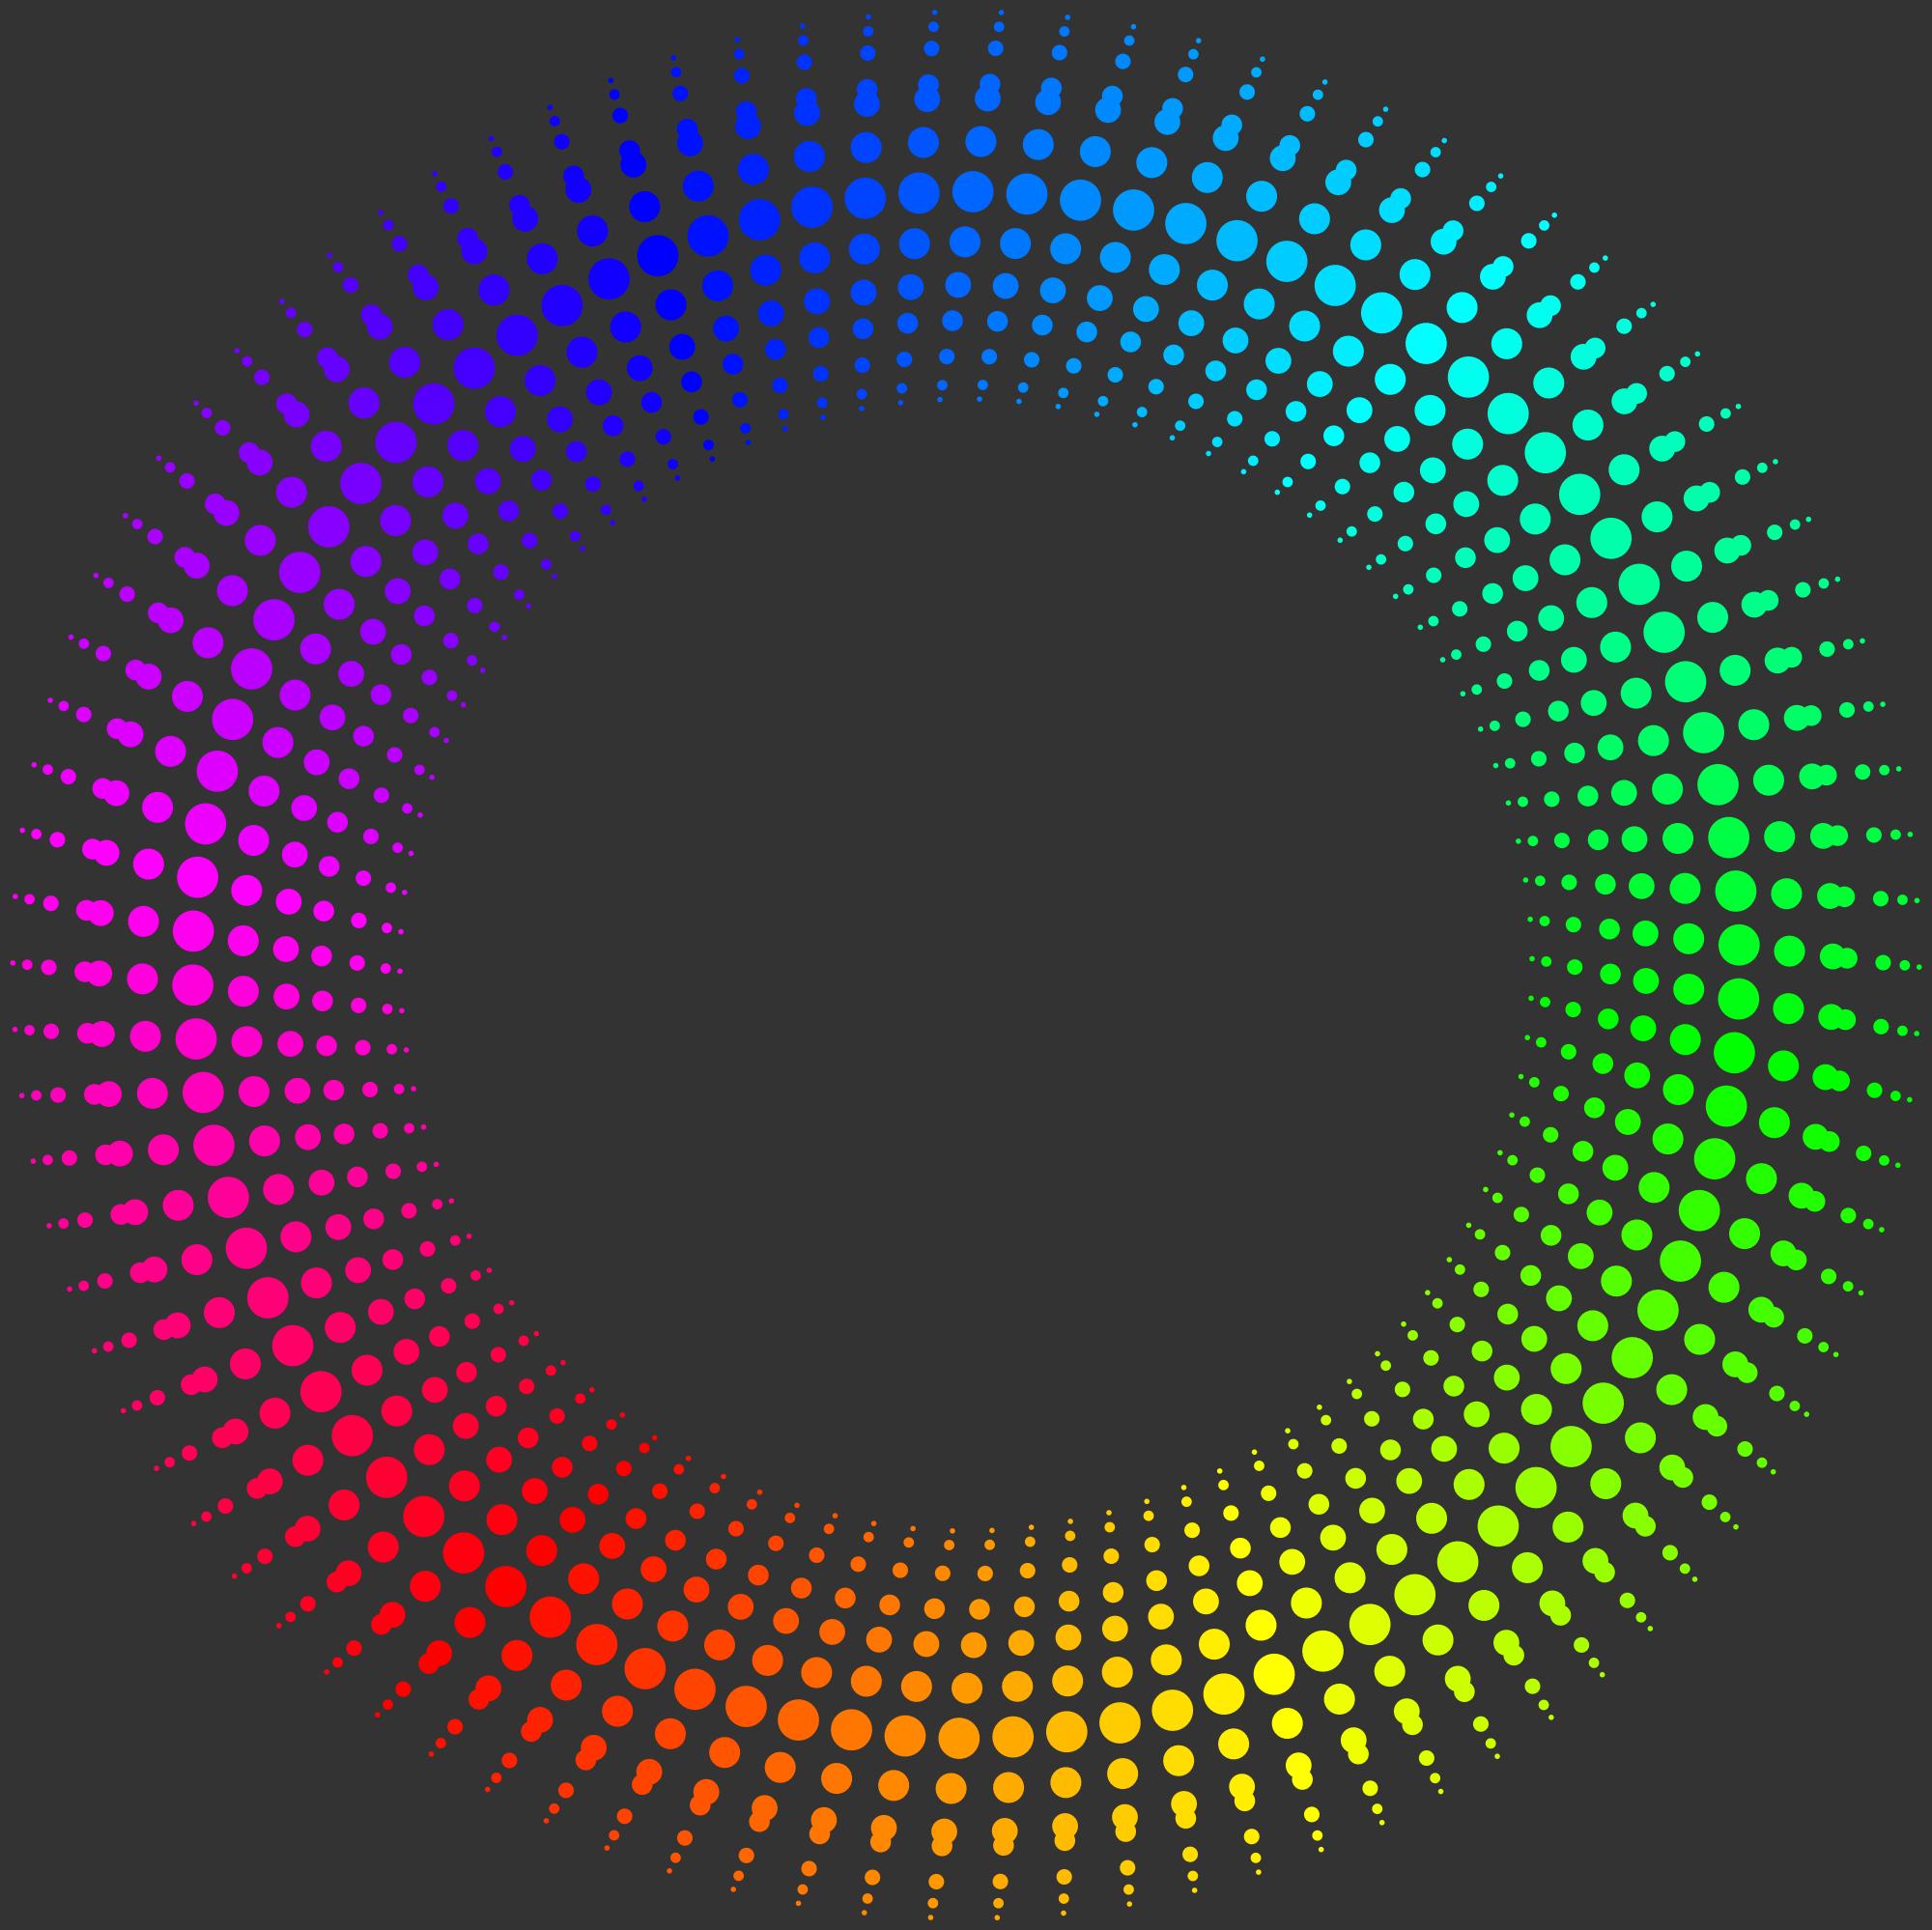 Fractal Circle Fractal 006: rainbow circleby